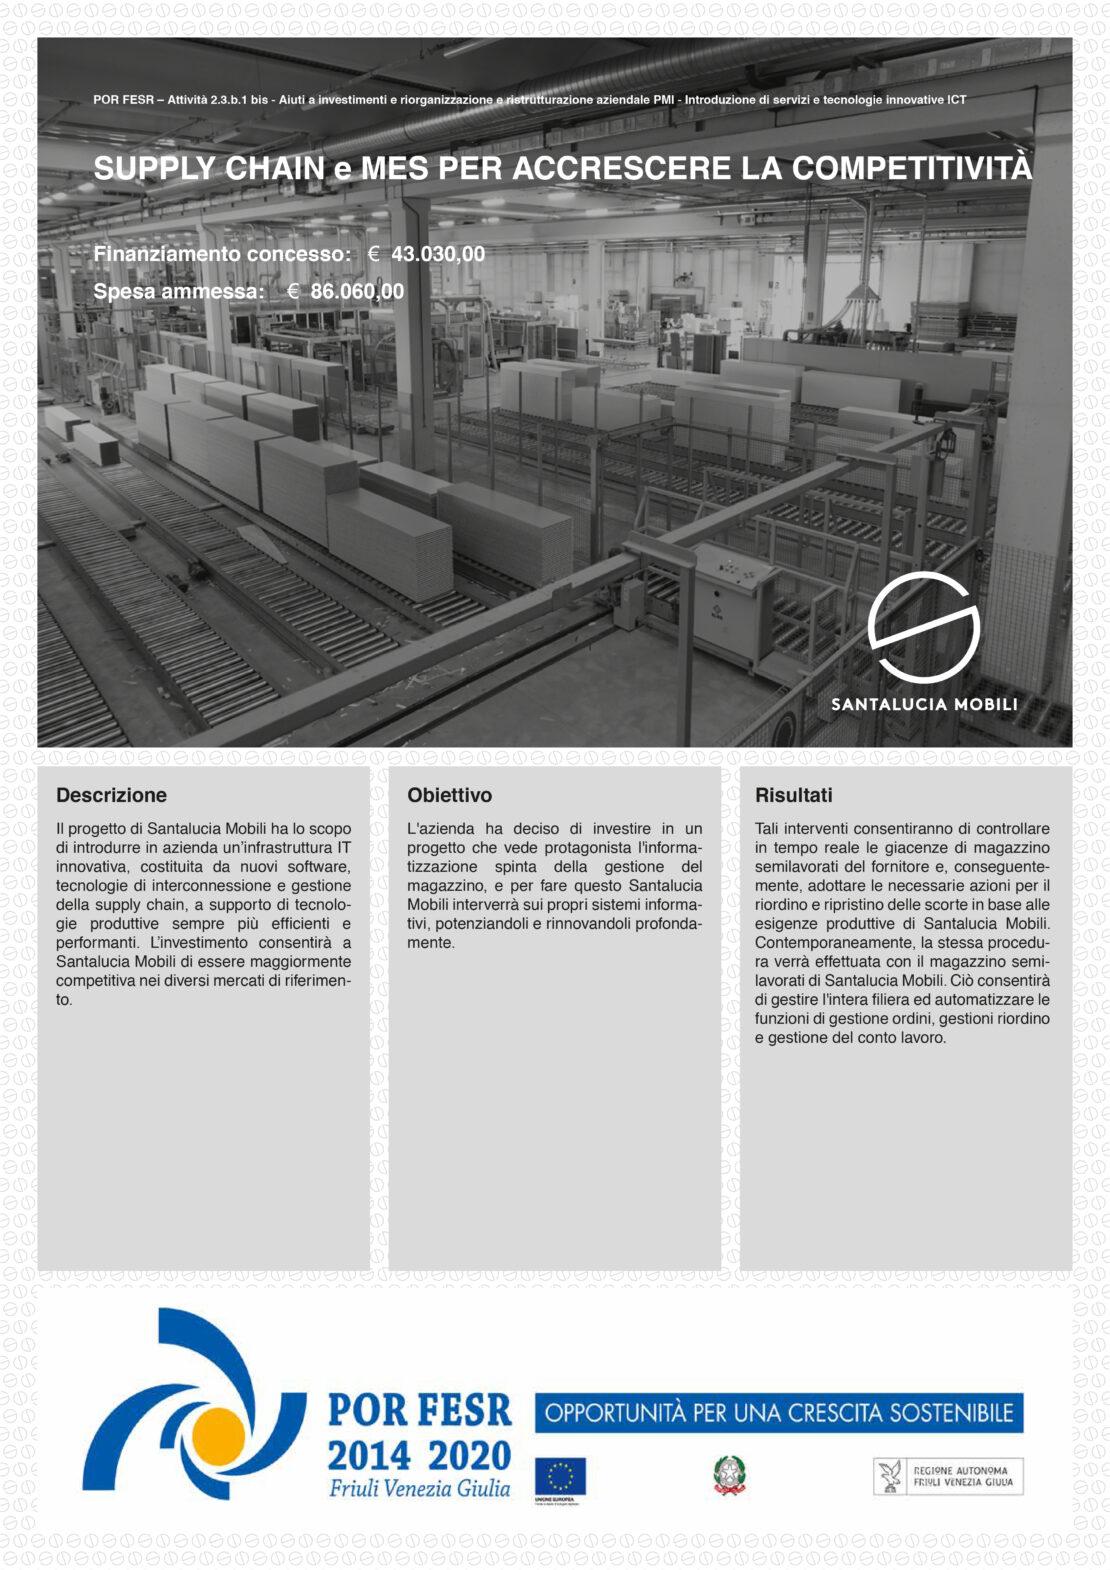 POR FESR Supply Chain